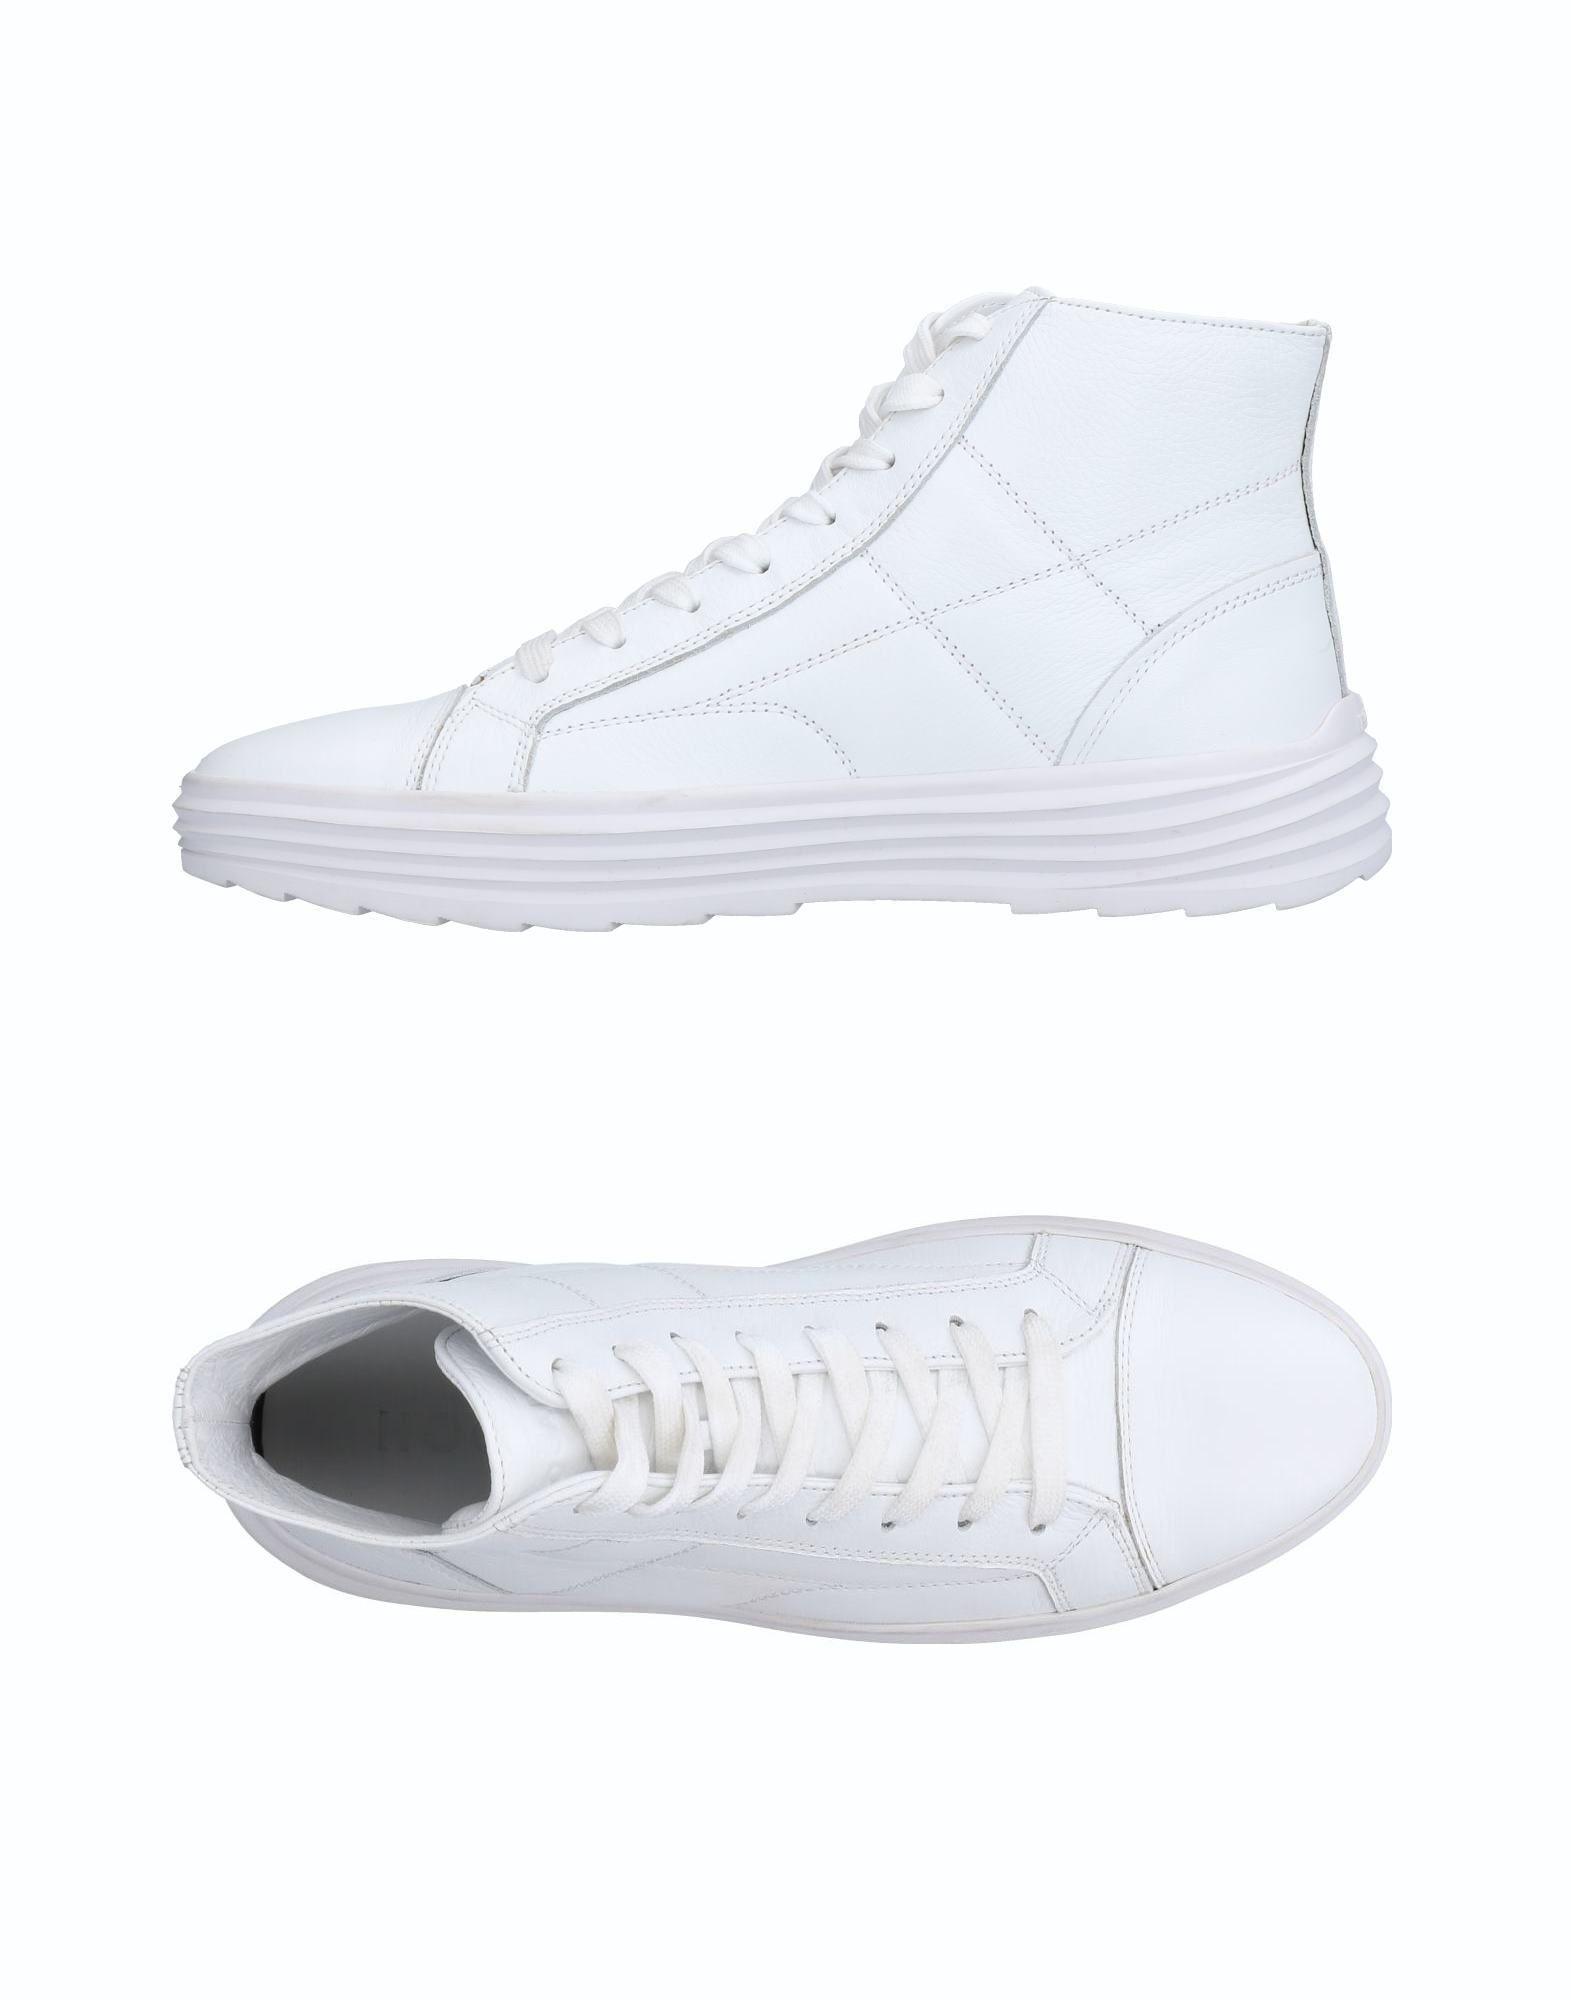 Hogan Sneakers Herren  11505488PK Gute Qualität beliebte Schuhe